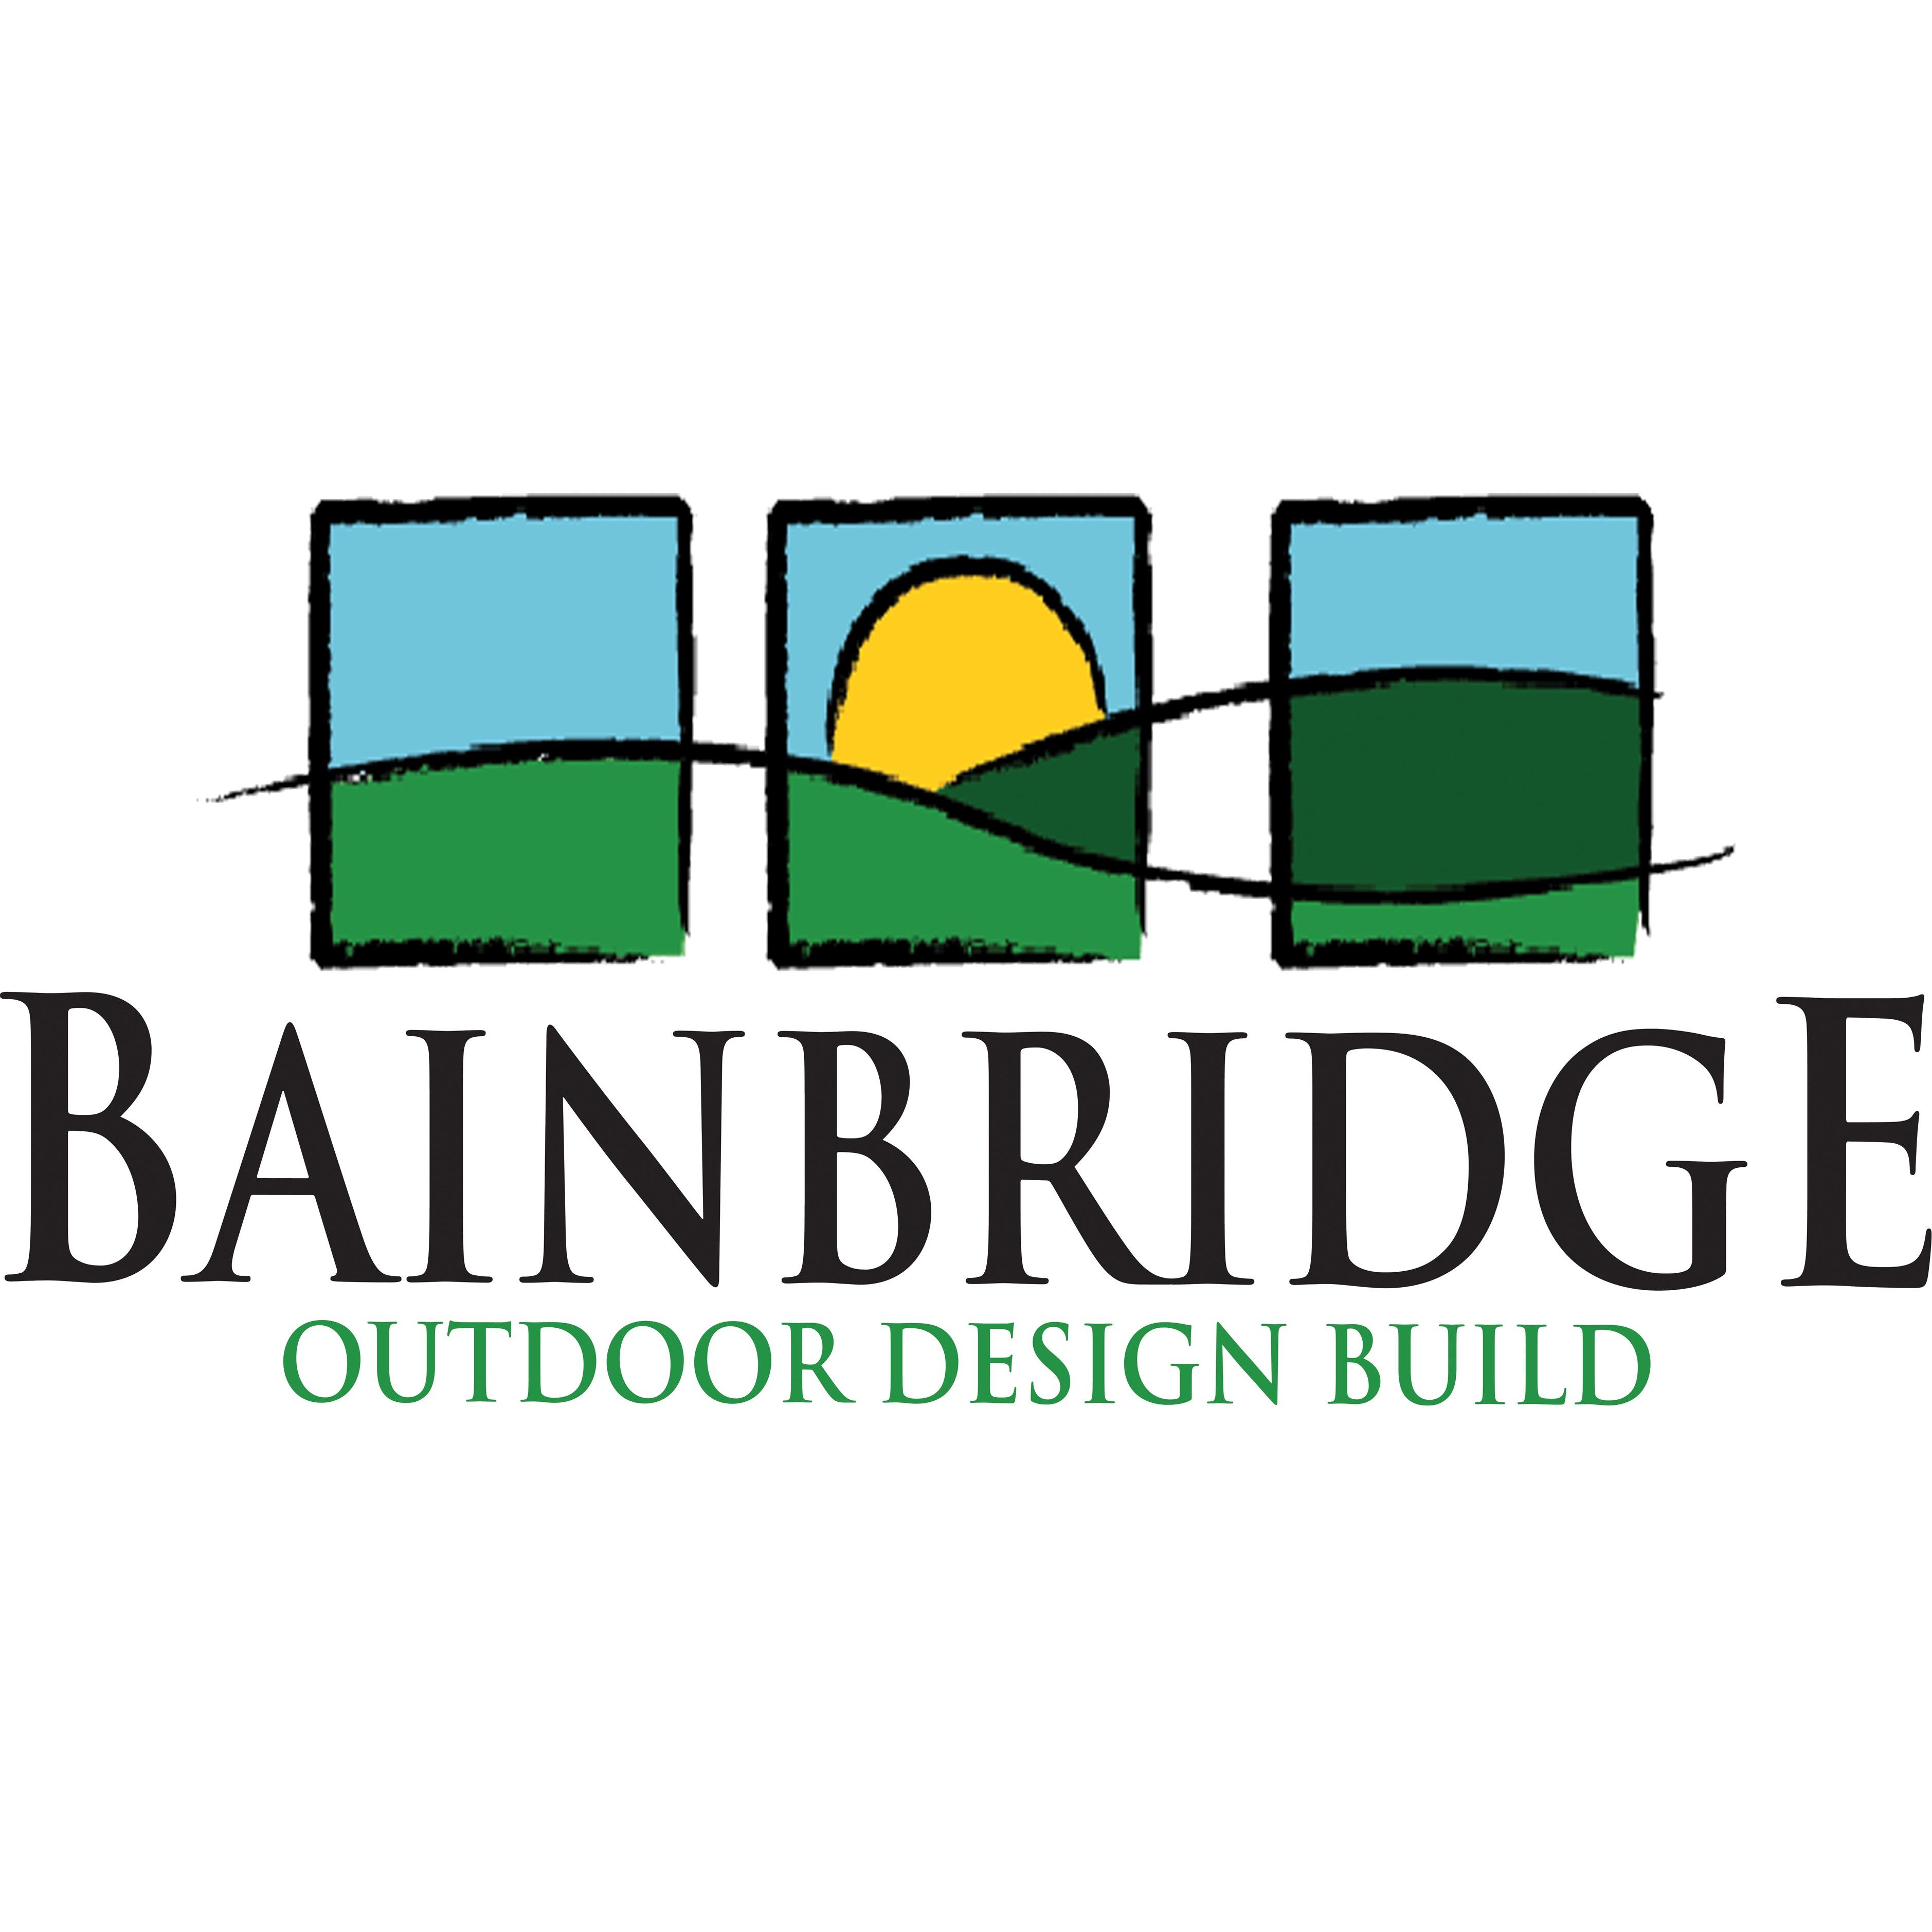 Bainbridge Outdoor Design Build image 1